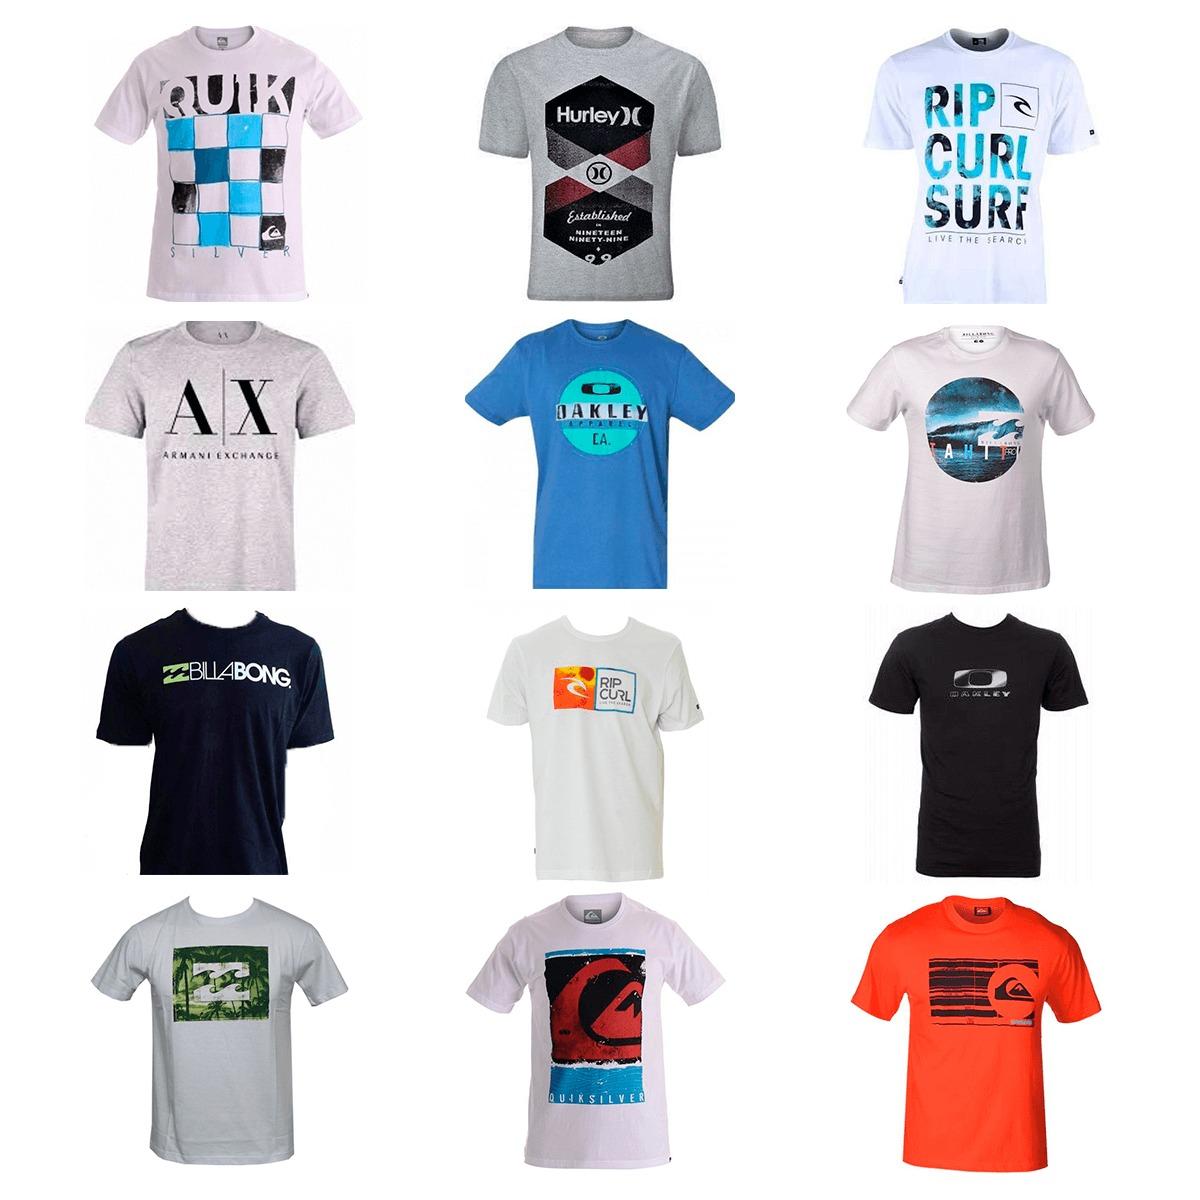 kit 20 camiseta camisa masculina marca estampada top atacado. Carregando  zoom. 60a22044681